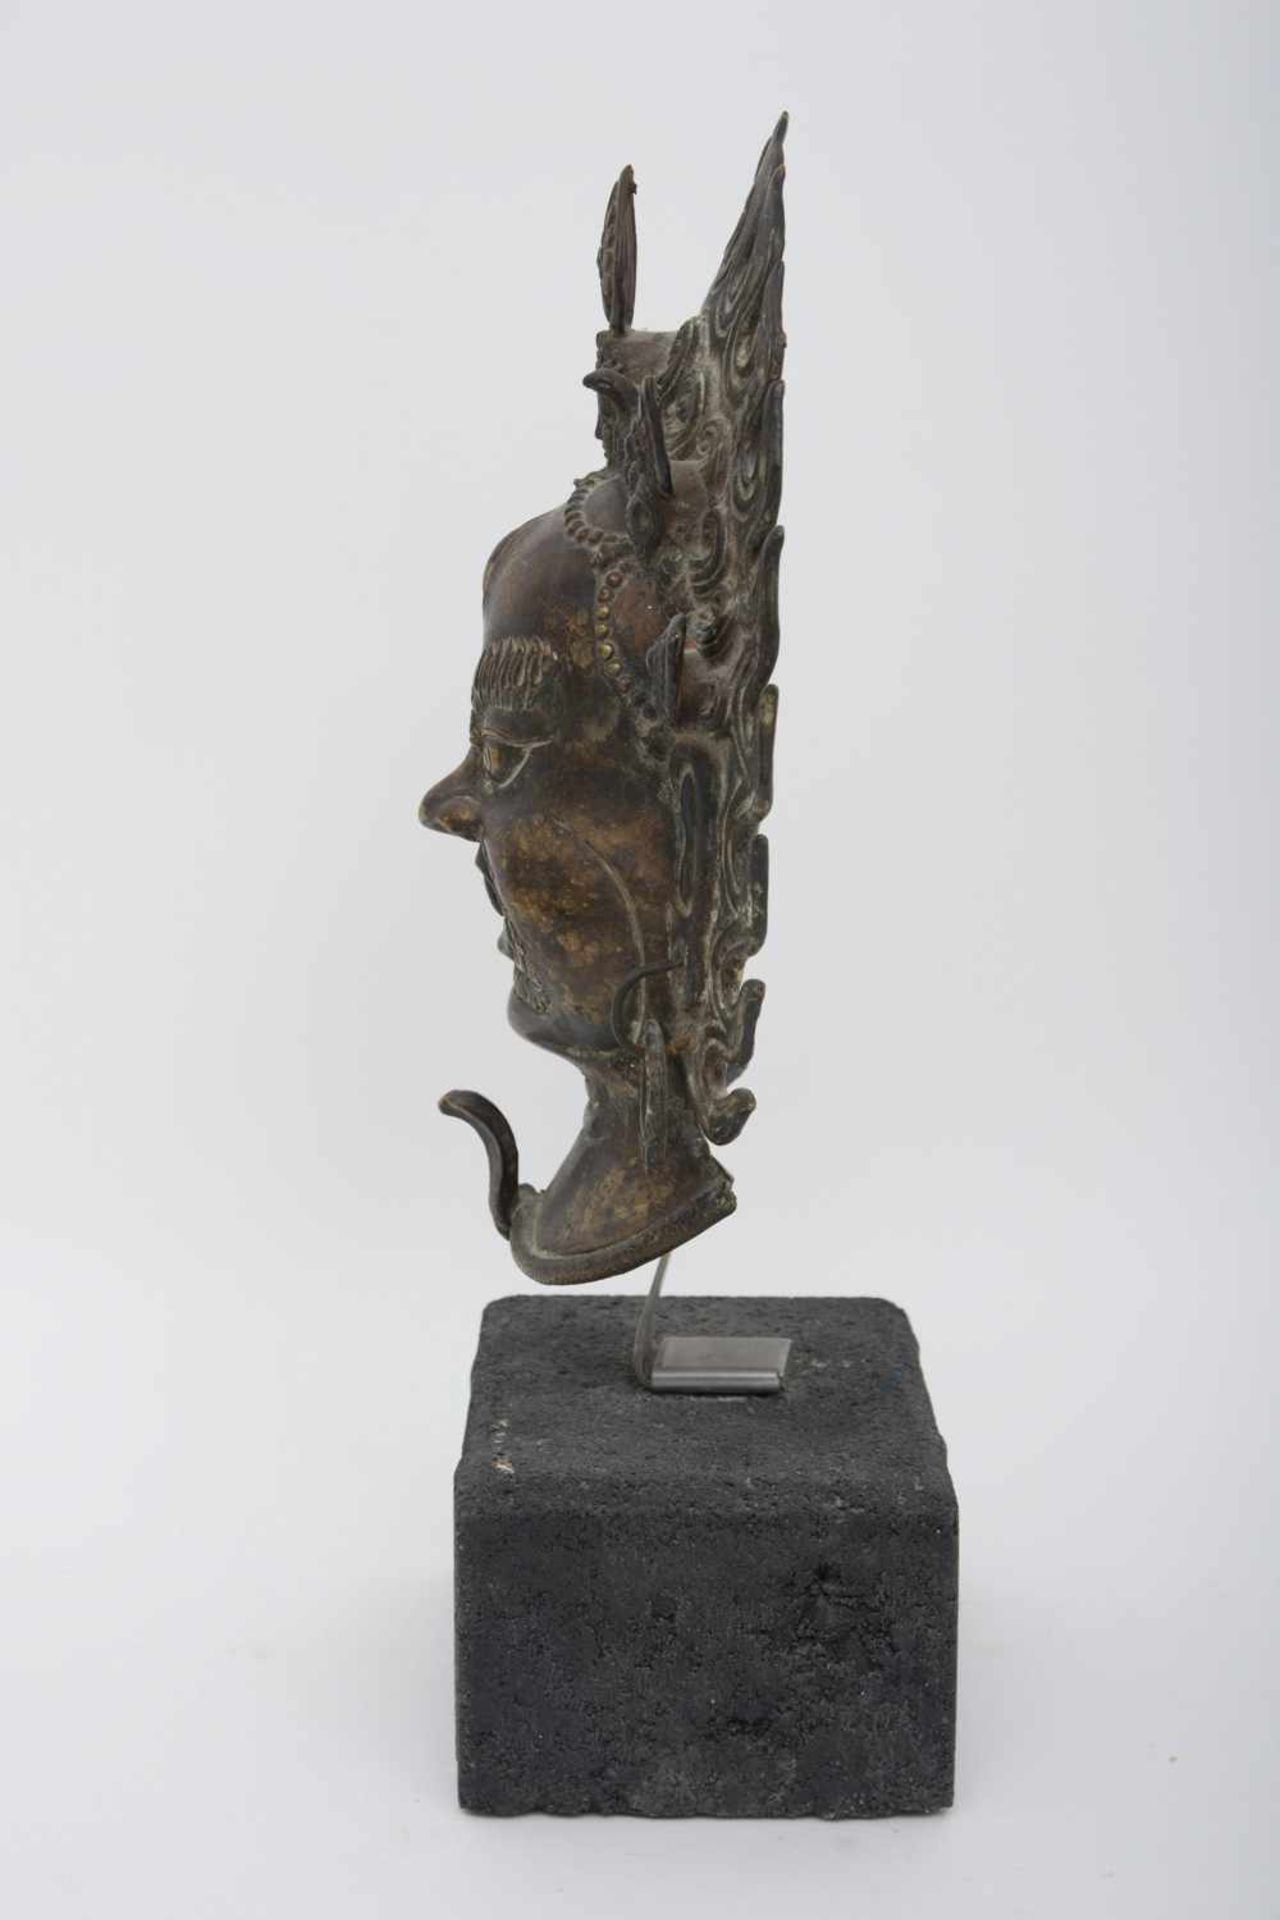 Los 18 - Maske des MAHAKALA,Bronze auf Steinsockel, Tibet/Nepal 20. Jajhrhundert Eine bronzene Maske des